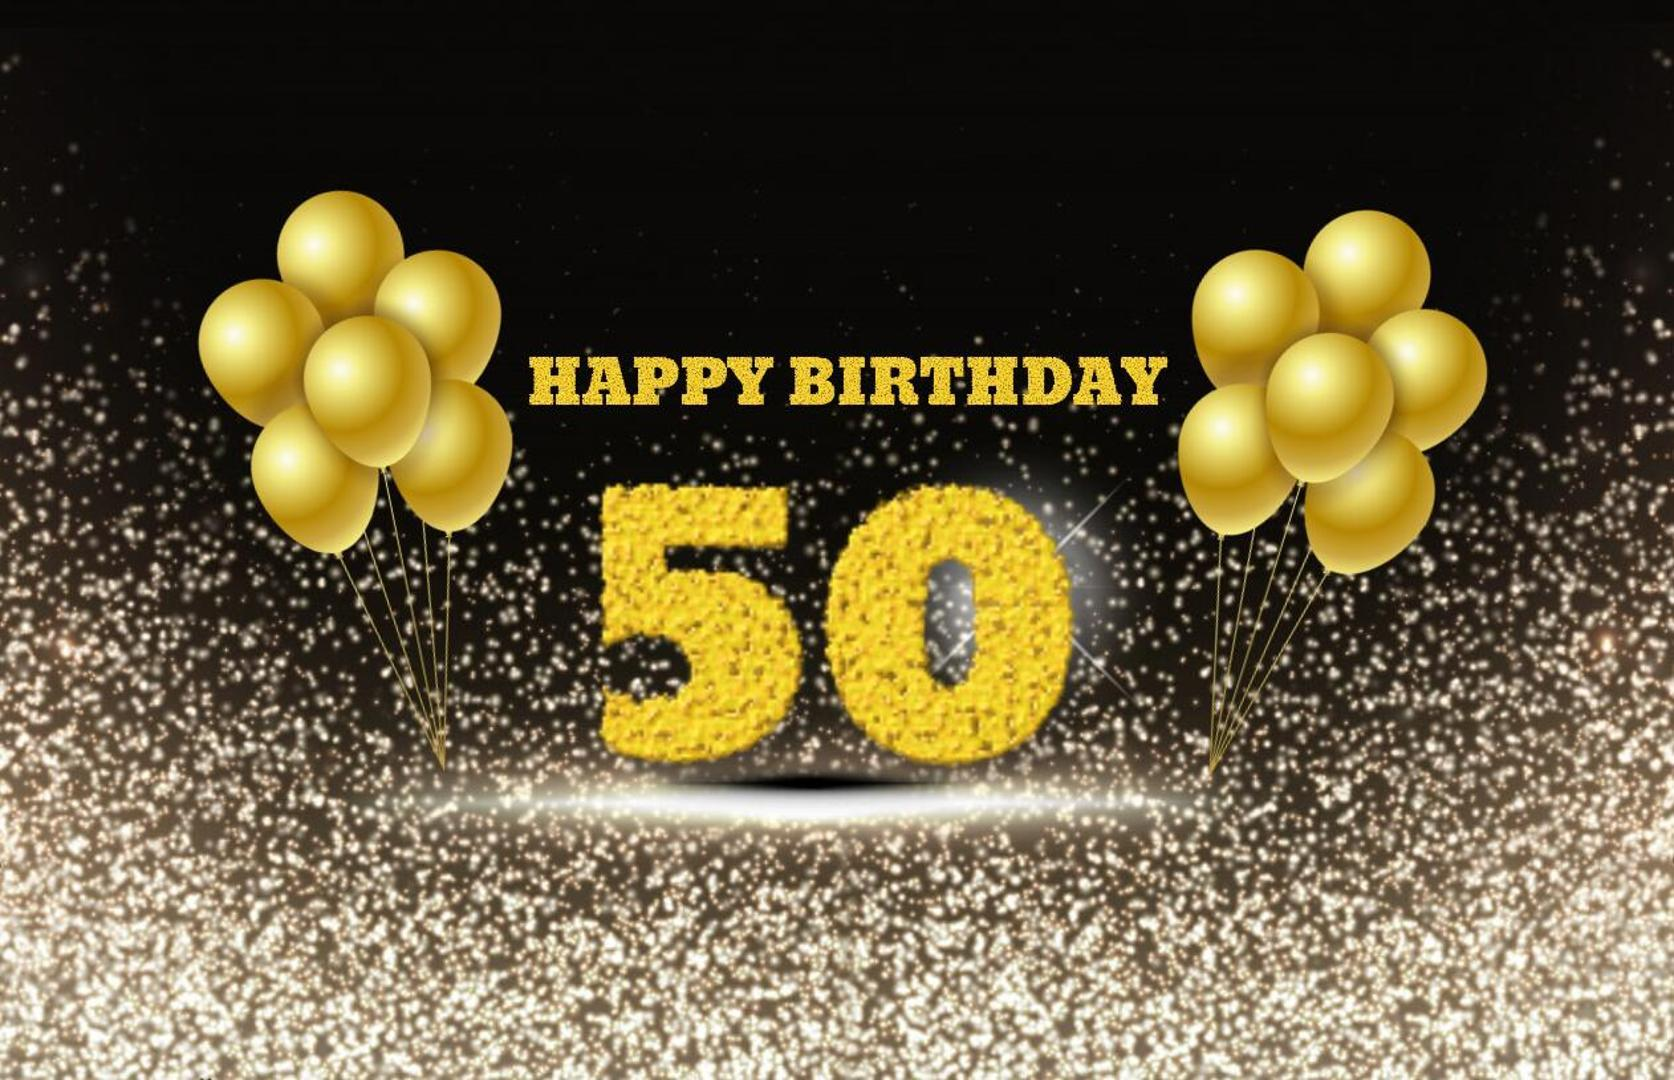 2019 50th Birthday Backdrop Black Golden Balloon Photo Photography